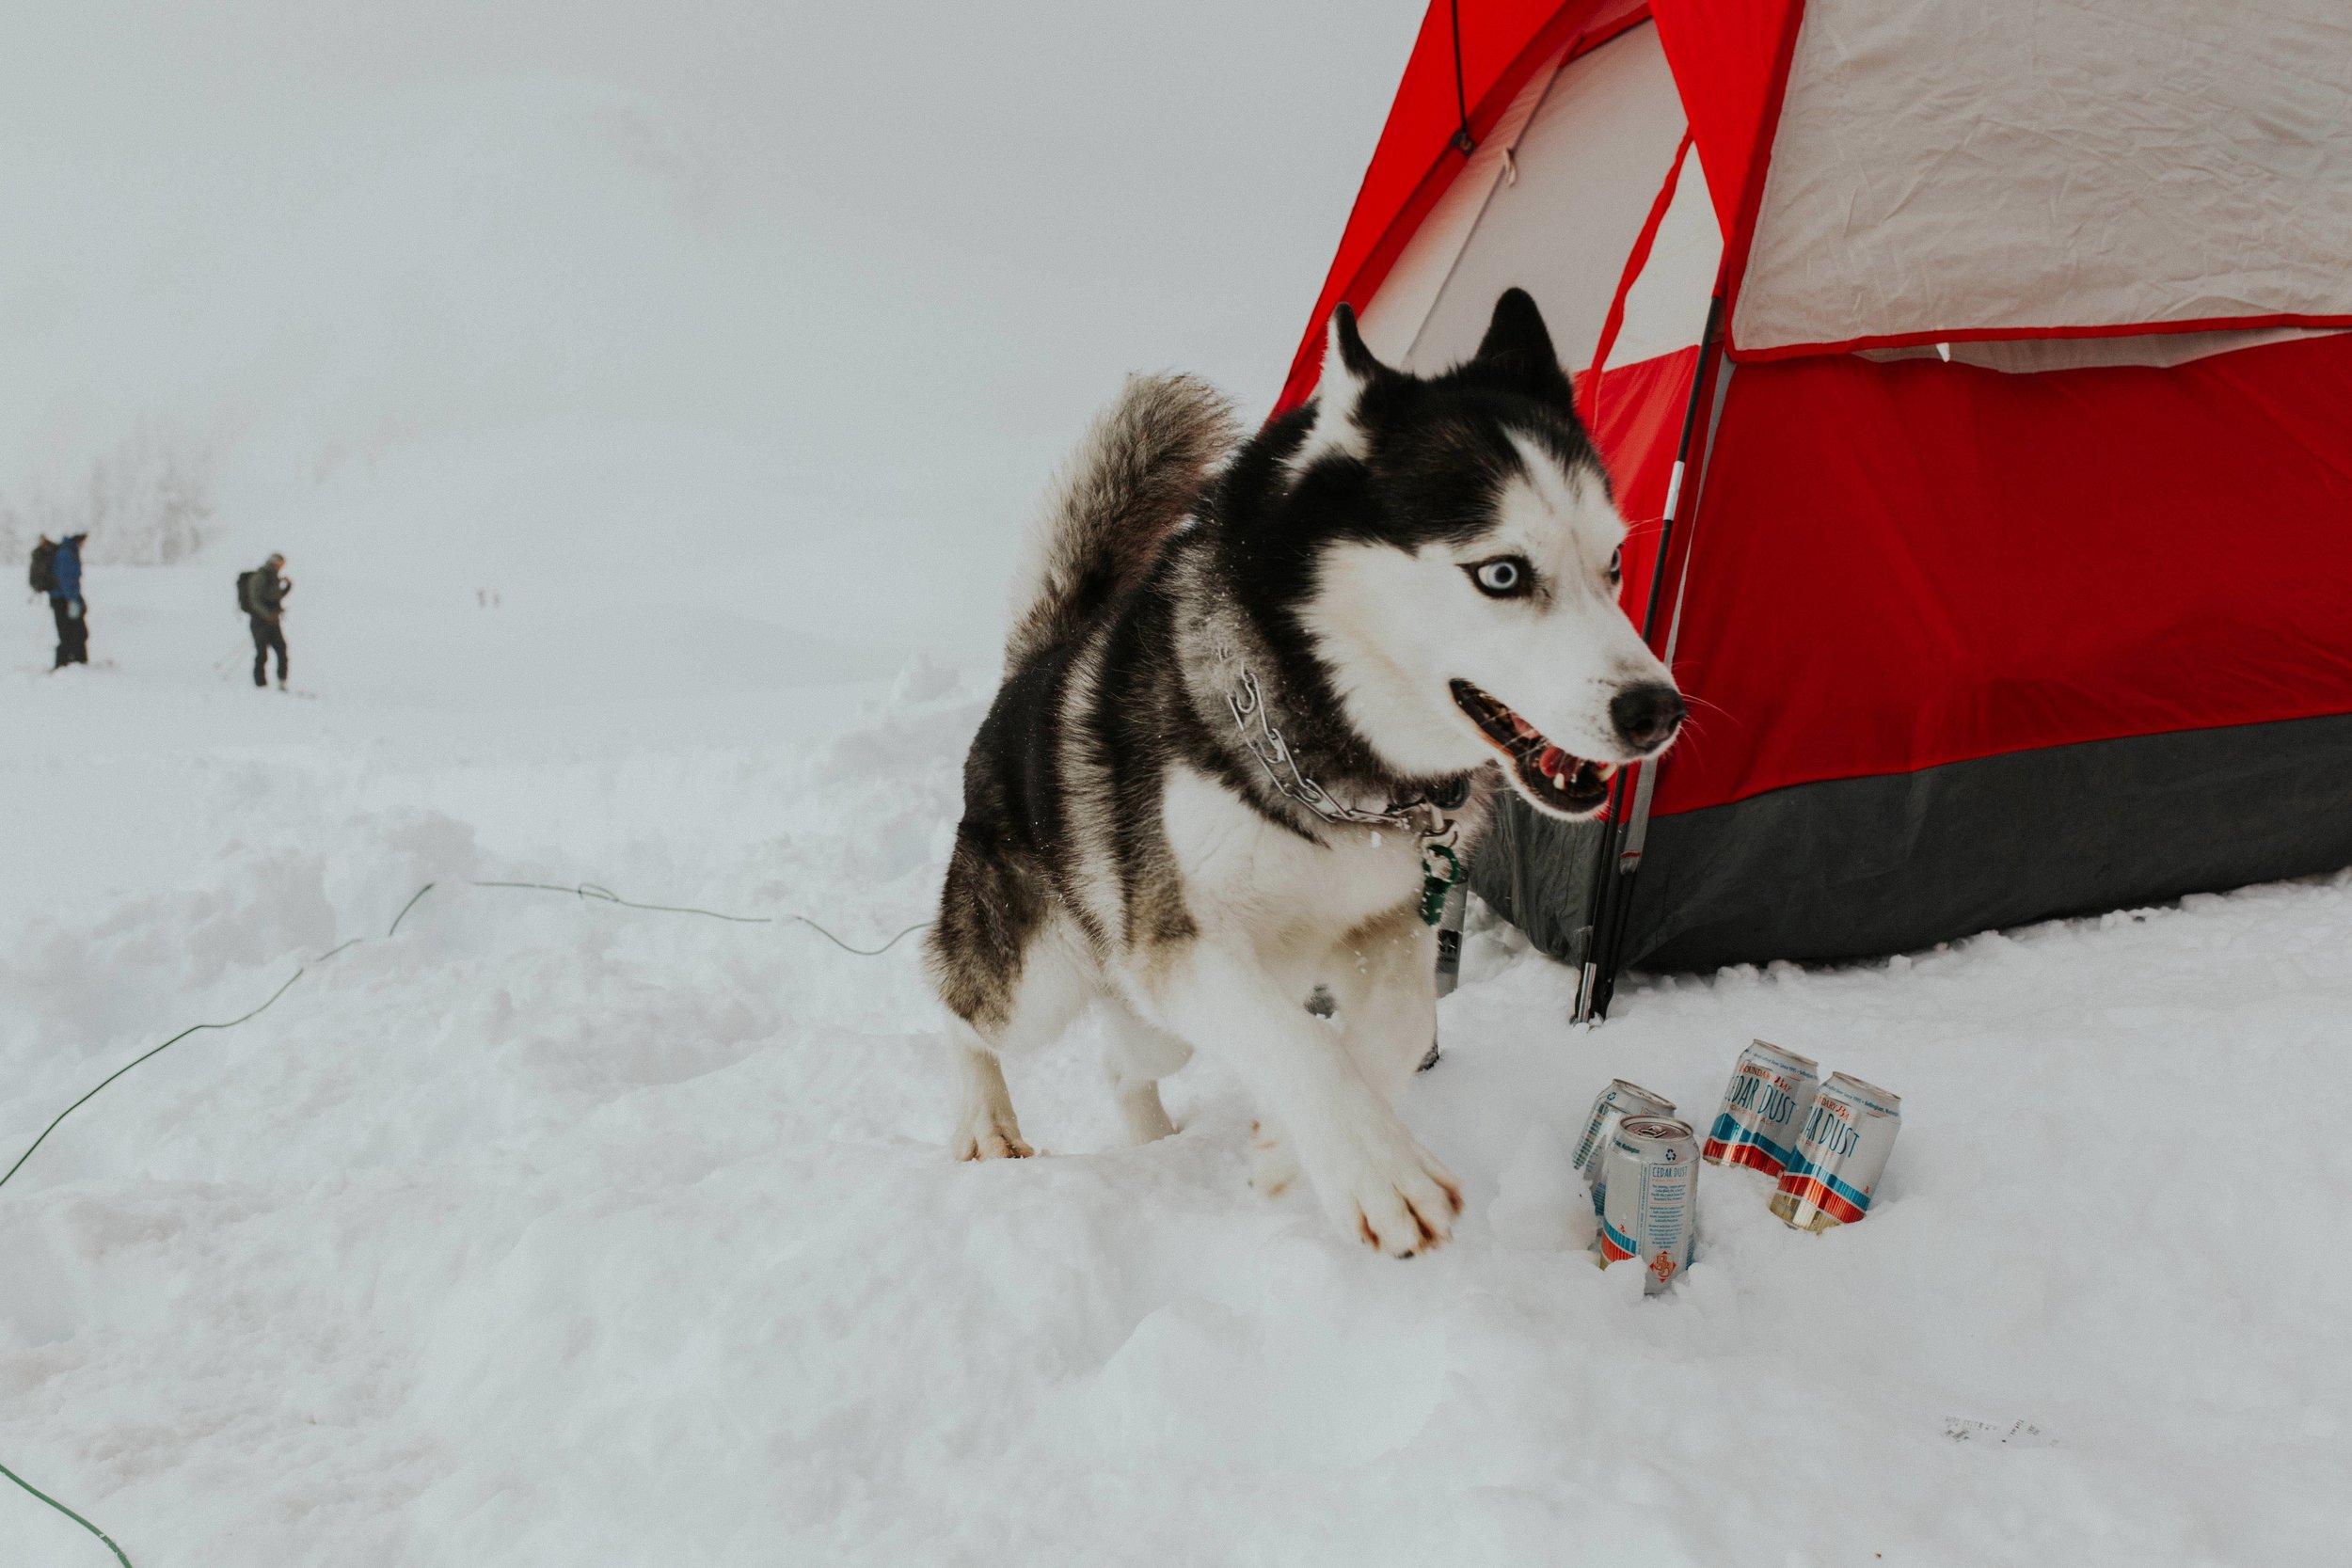 adventure-wedding-photographer-artist-point-snow-camping-elopement-photographer-husky-beer.jpg